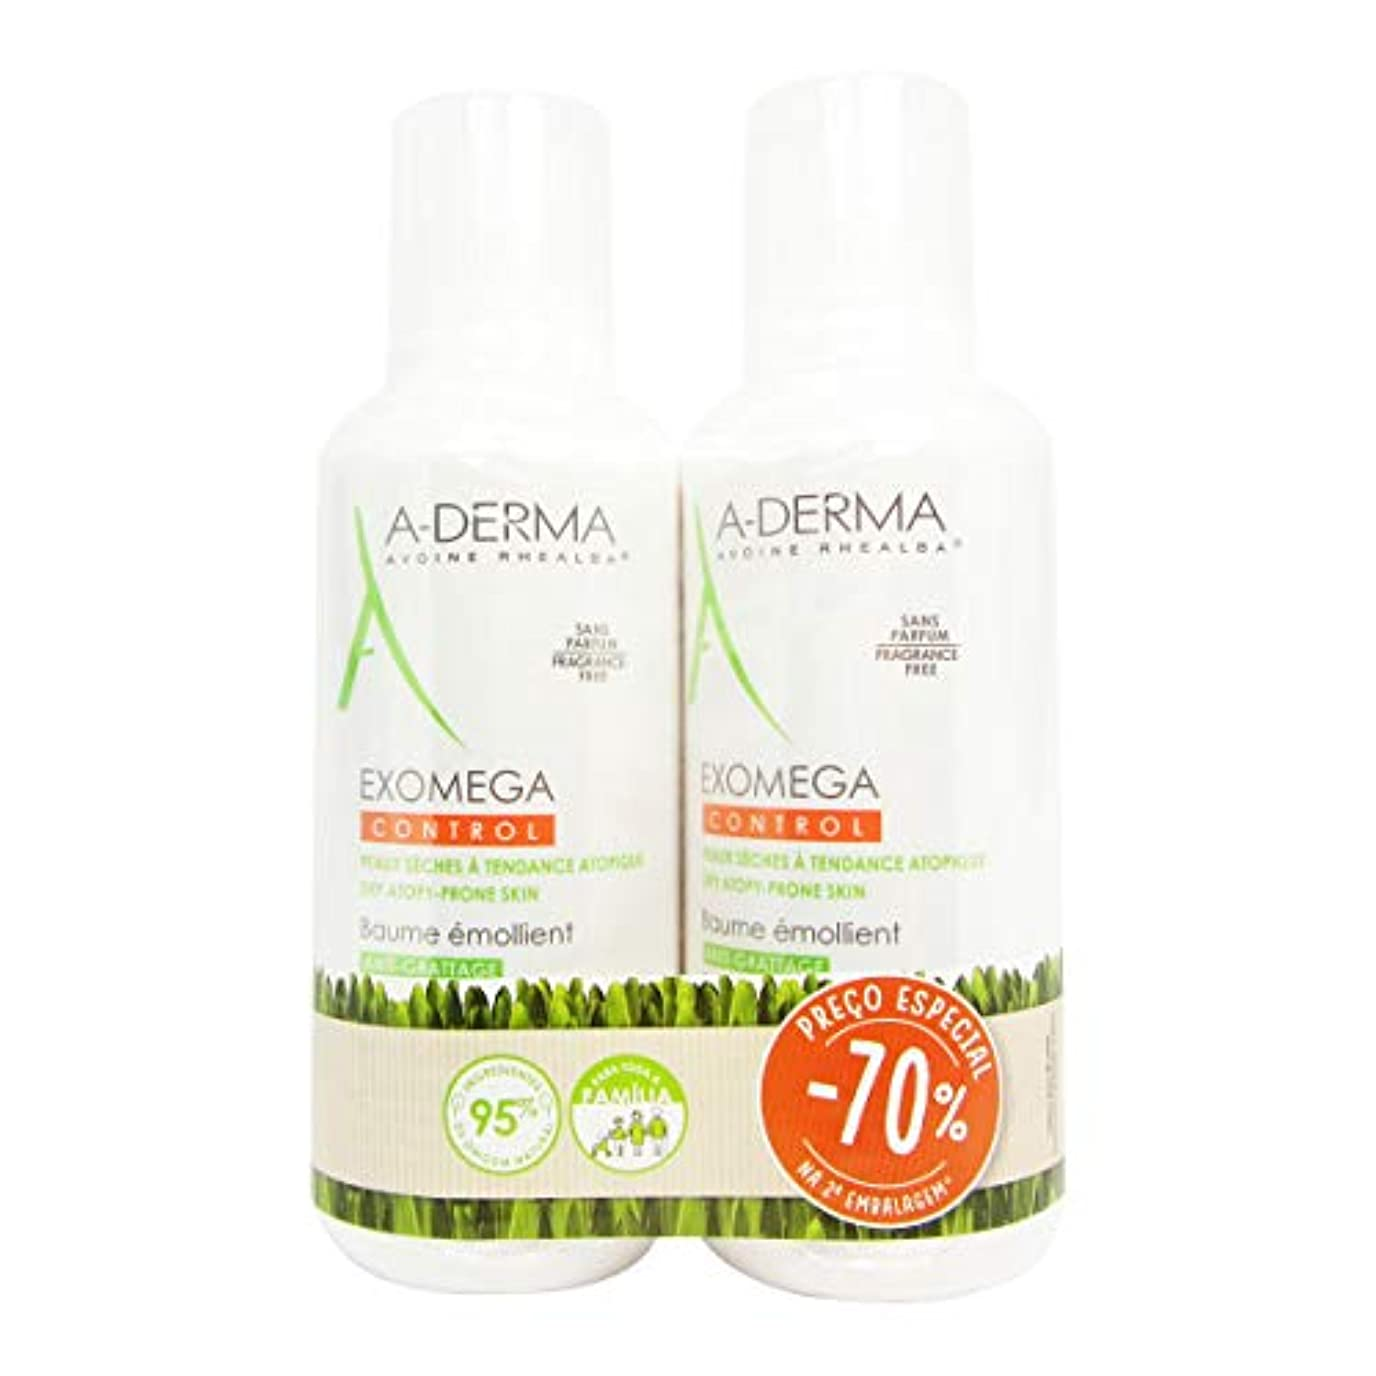 A-Derma Exomega Control Emollient Balm 400mlx2